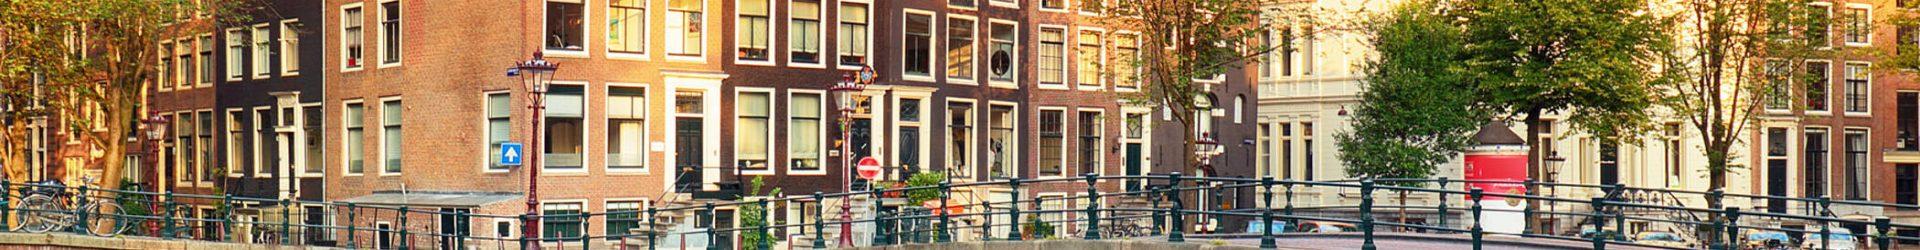 Amsterdams Sprookjesboek